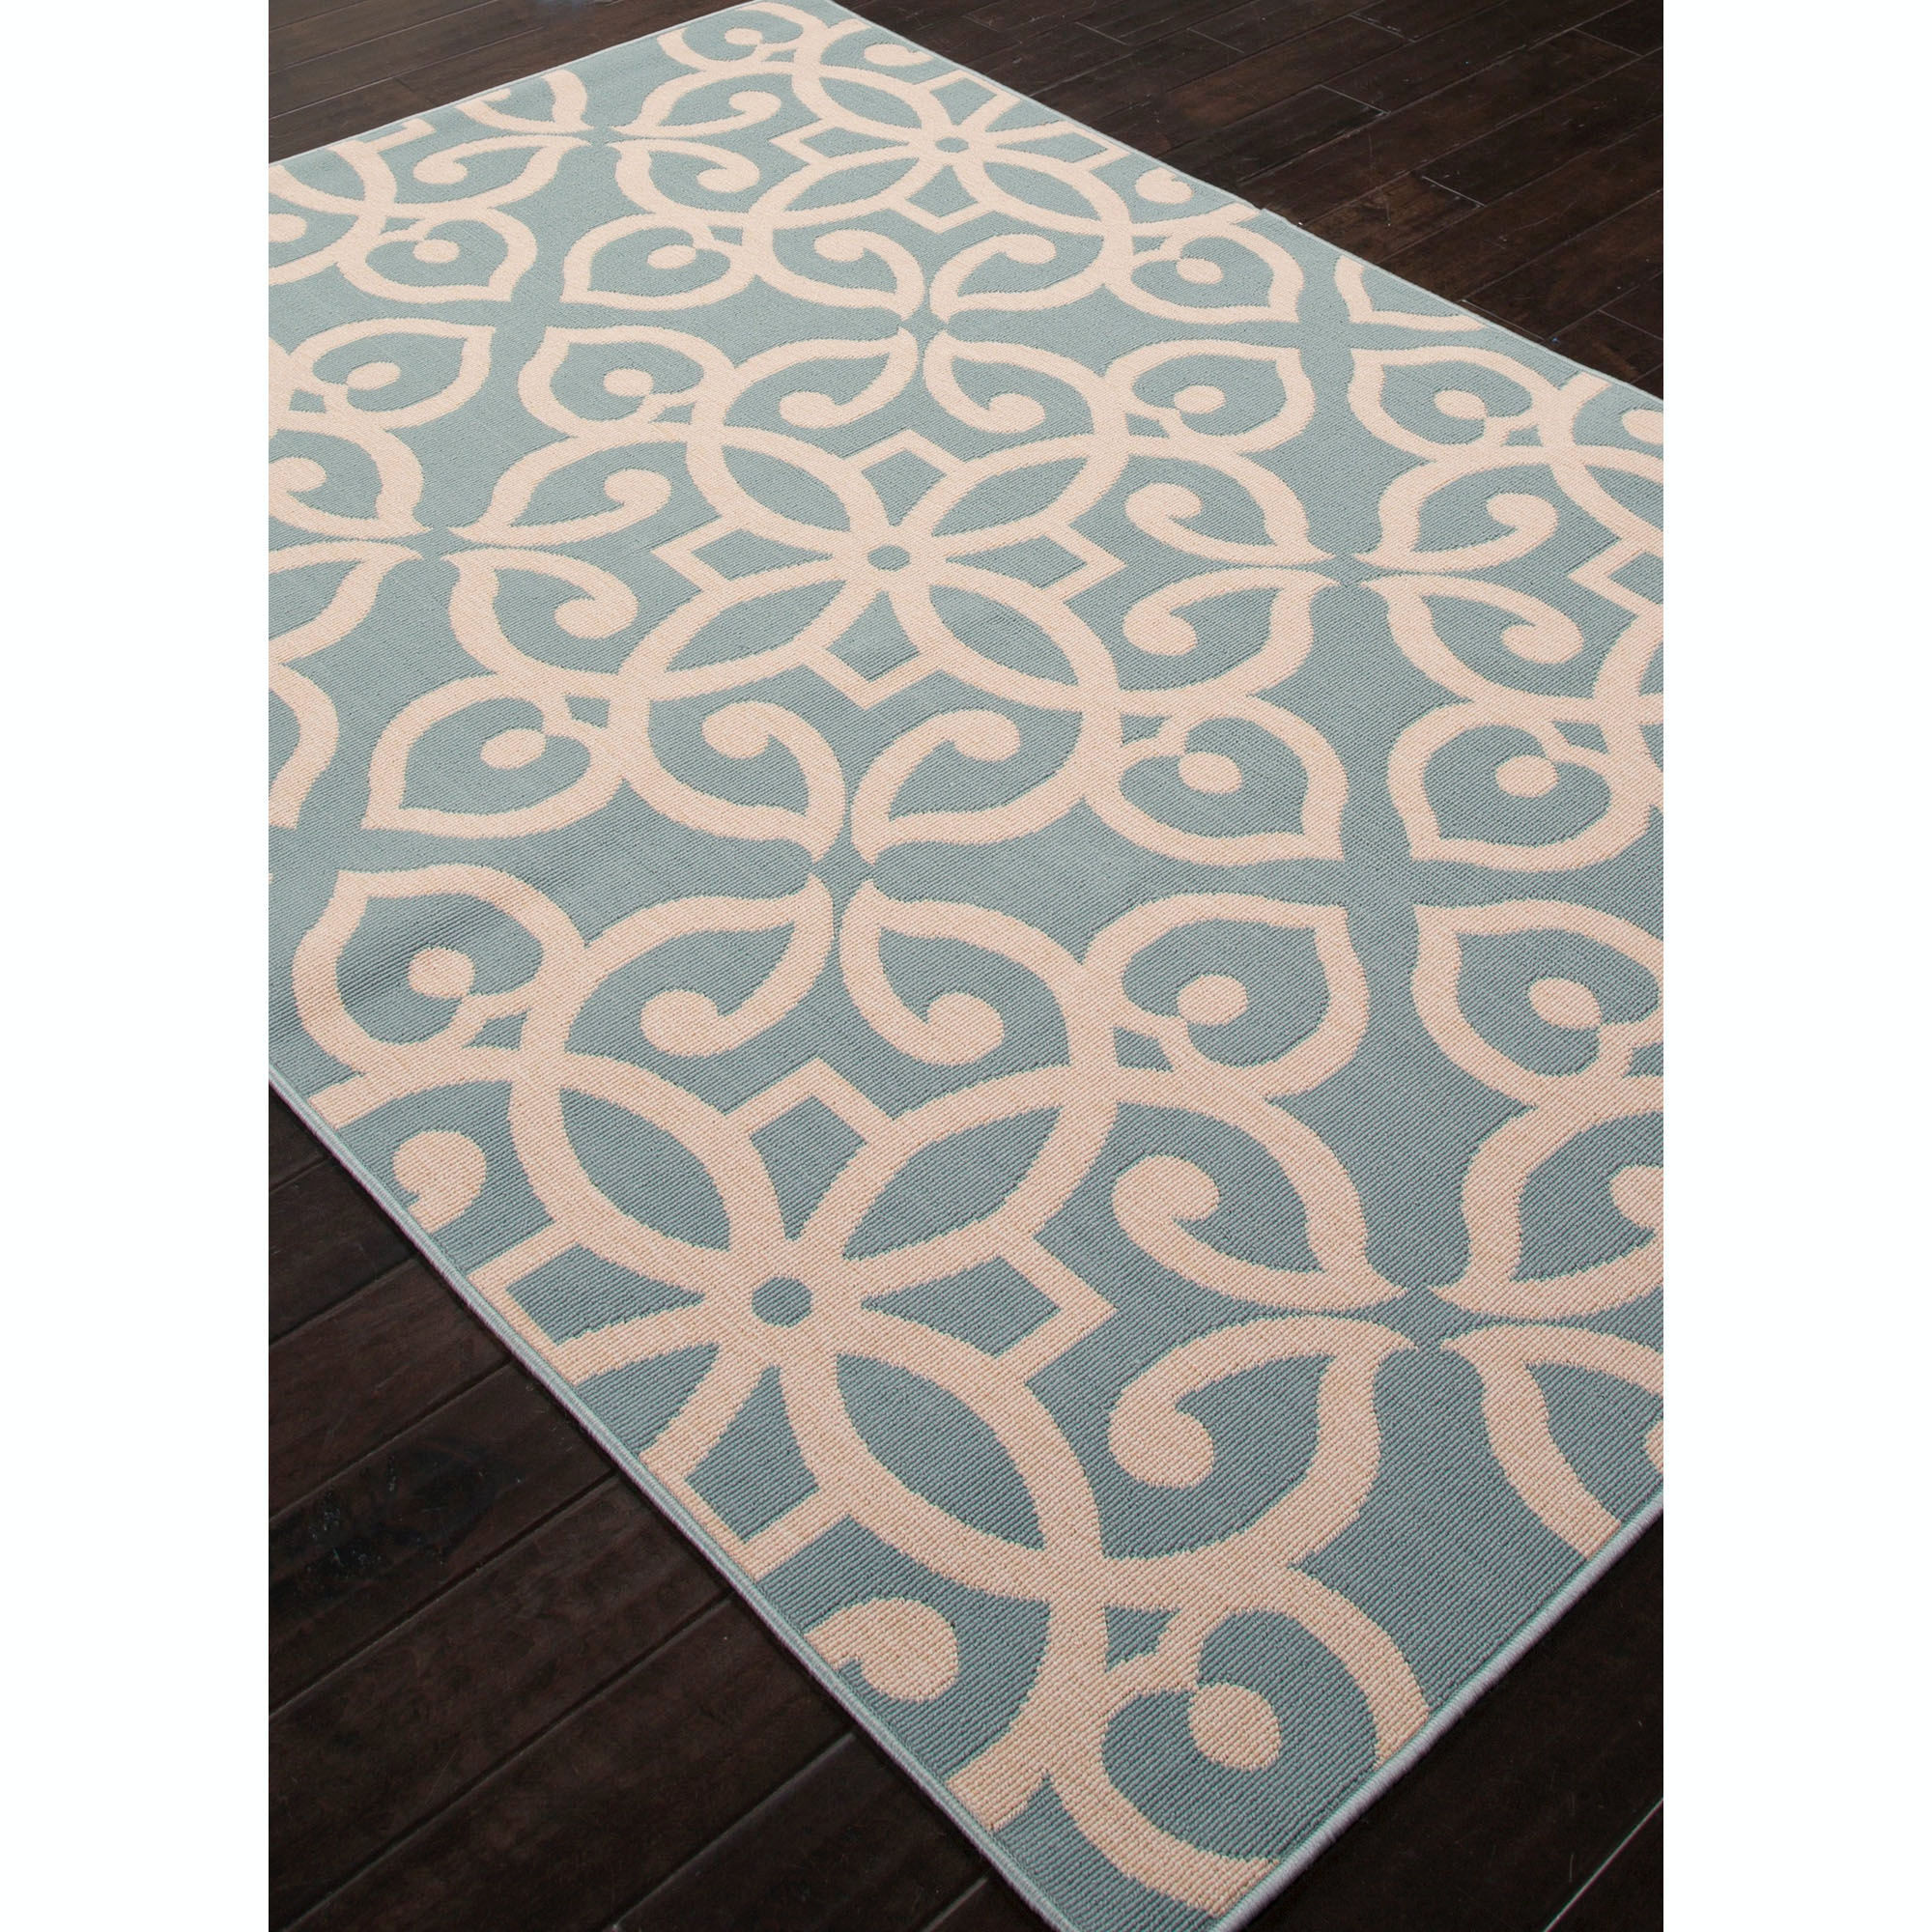 ... Jaipur Rugs Jaipur Indoor Outdoor Geometric Pattern Blue/Taupe U0026 Tan  Polypropylene Area Rug ...